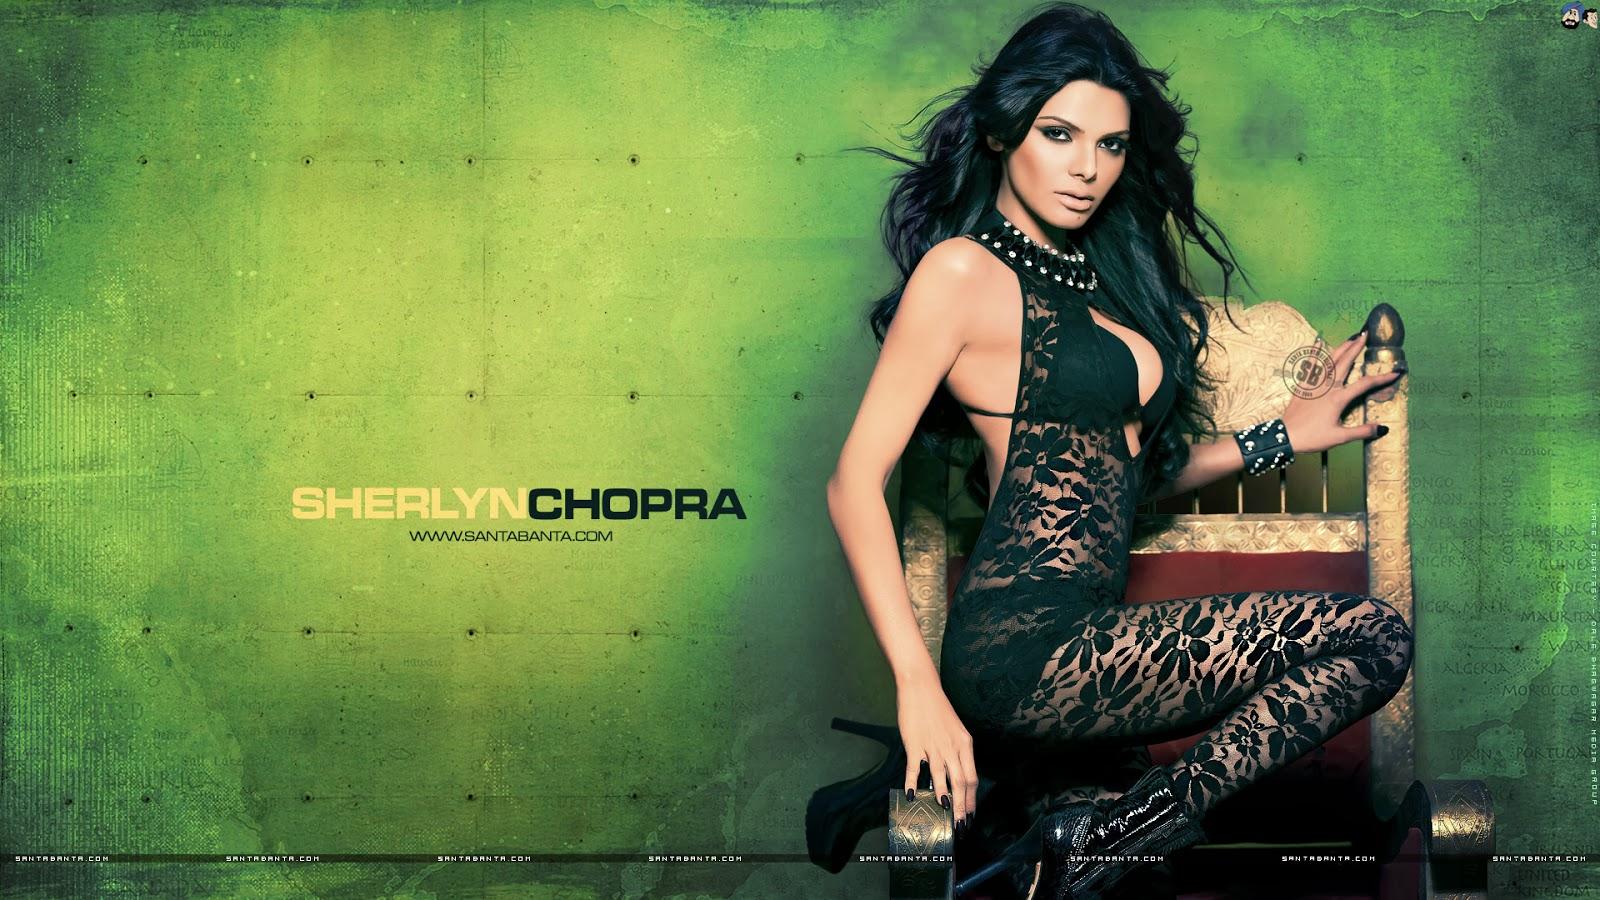 Beautiful Bollywood Diva Aishwarya Rai Images and